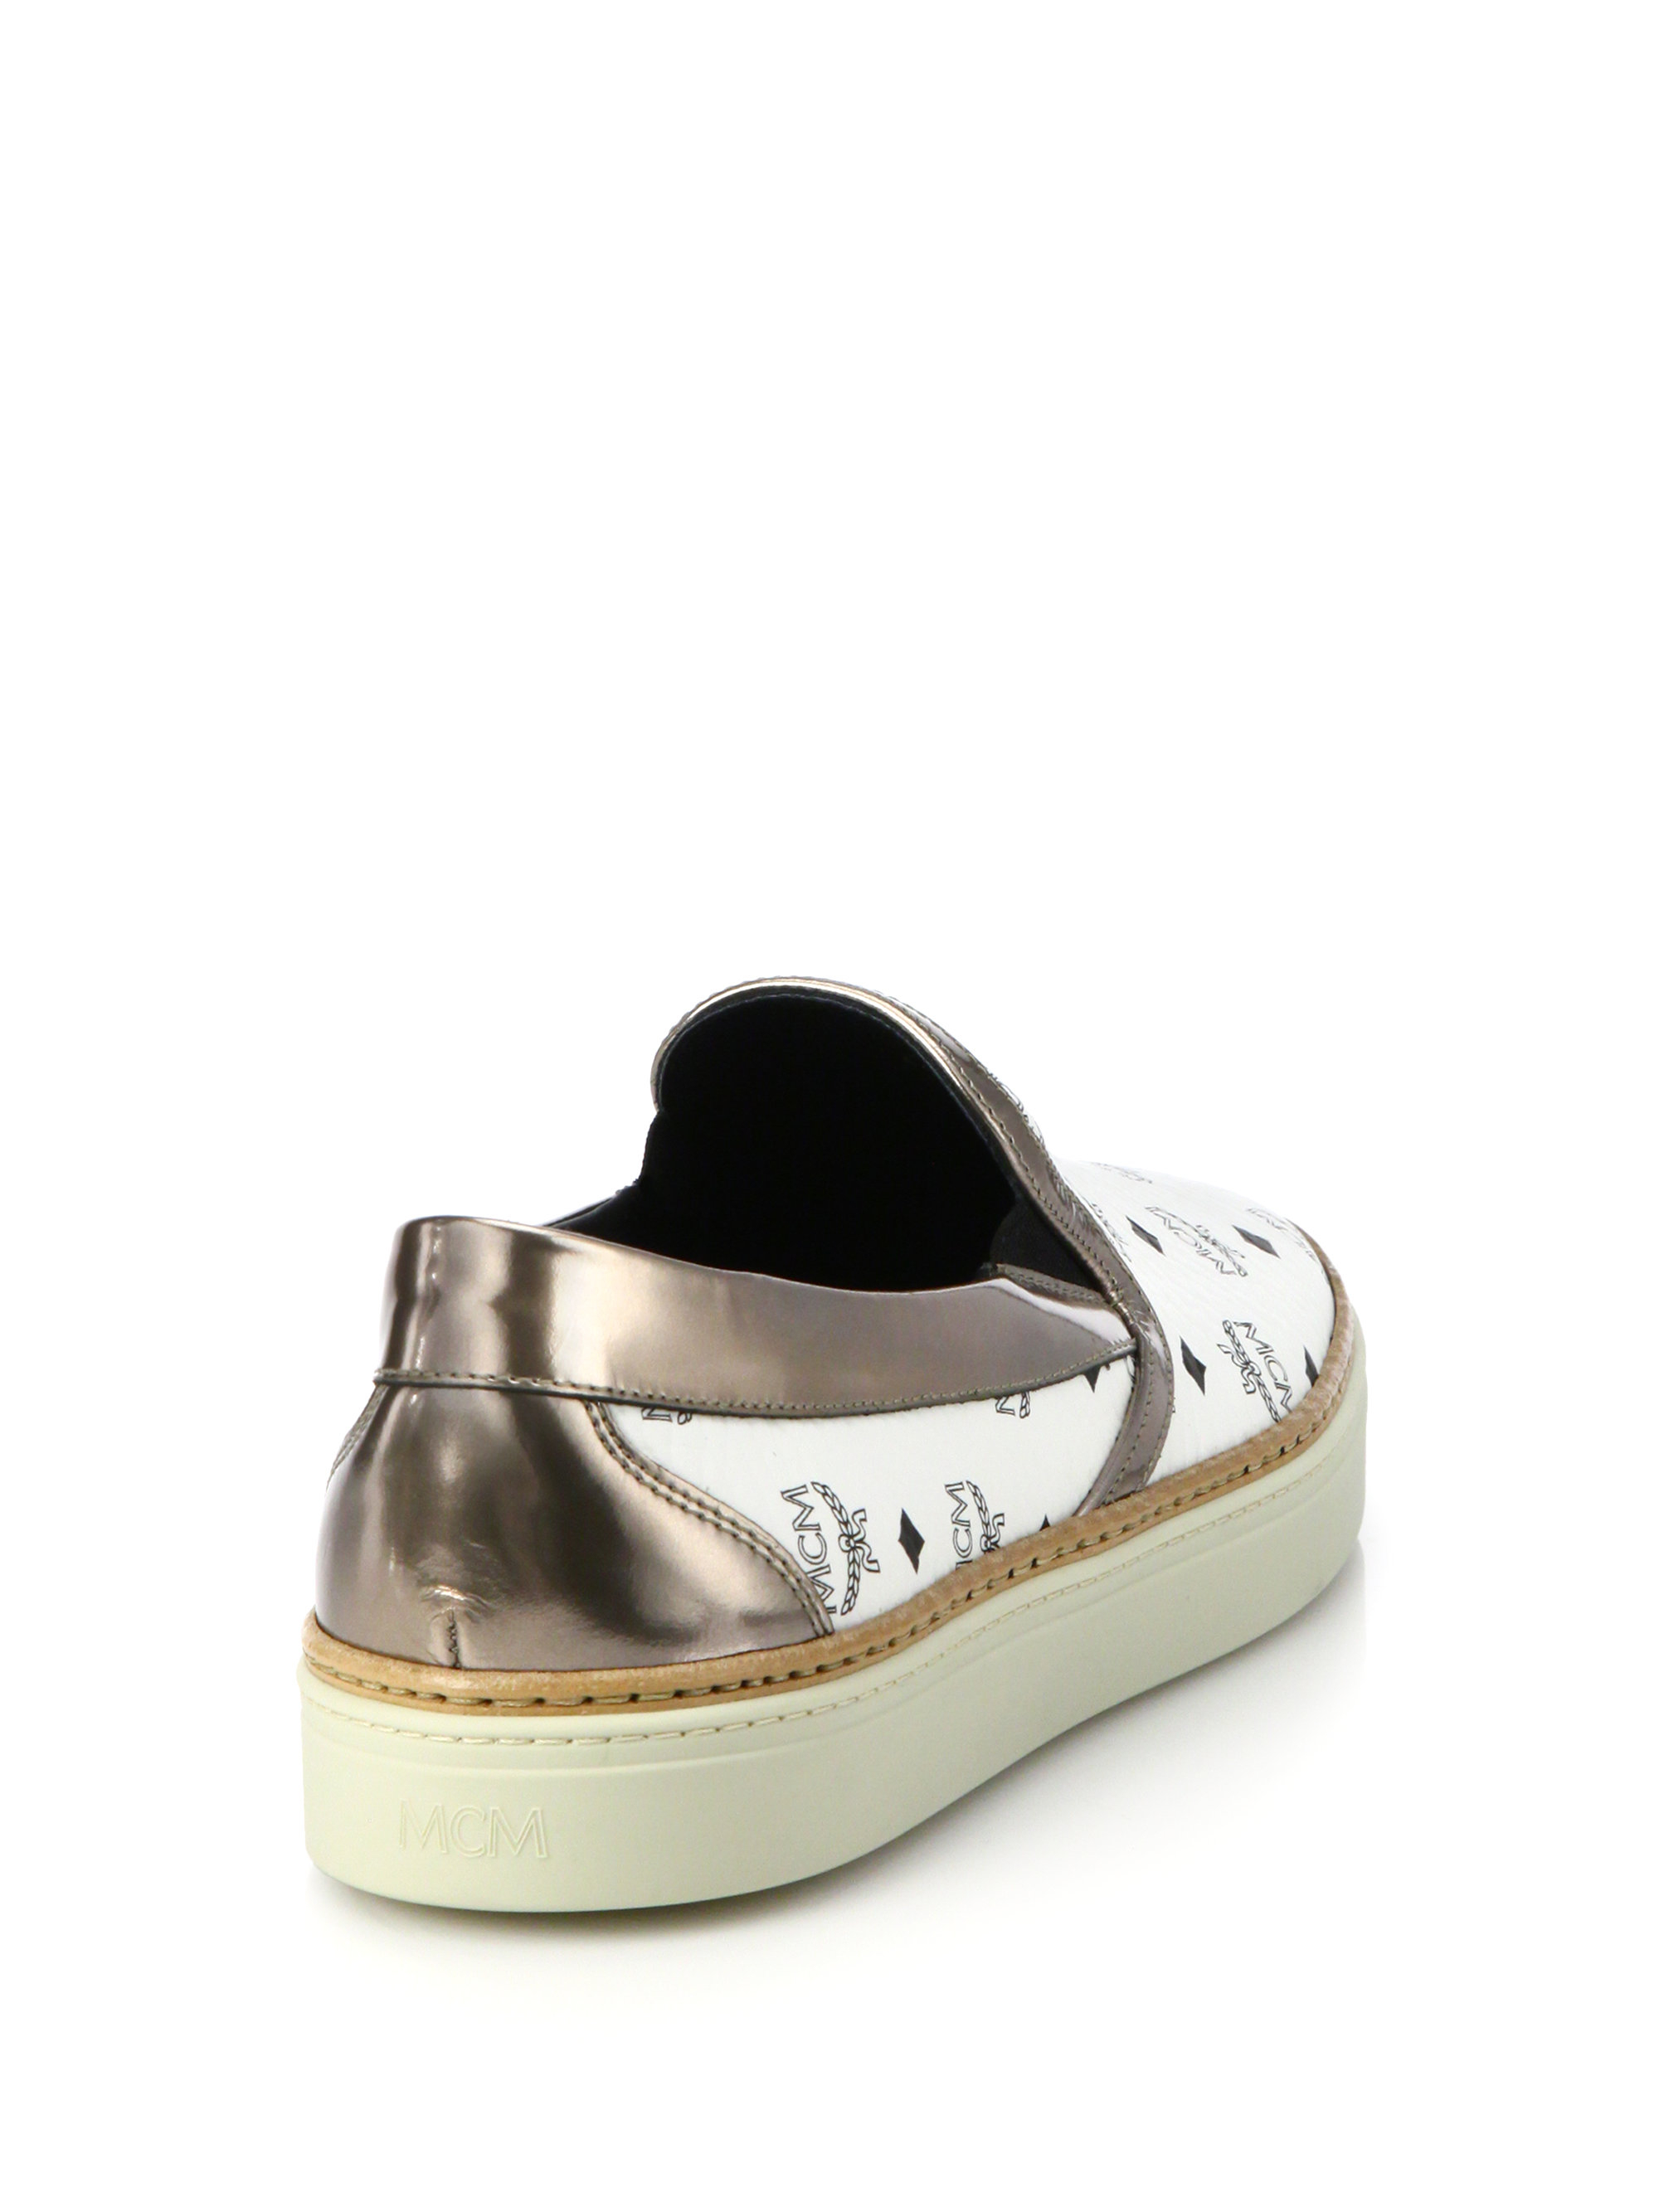 Mcm Slip On Logo Sneakers In White Lyst